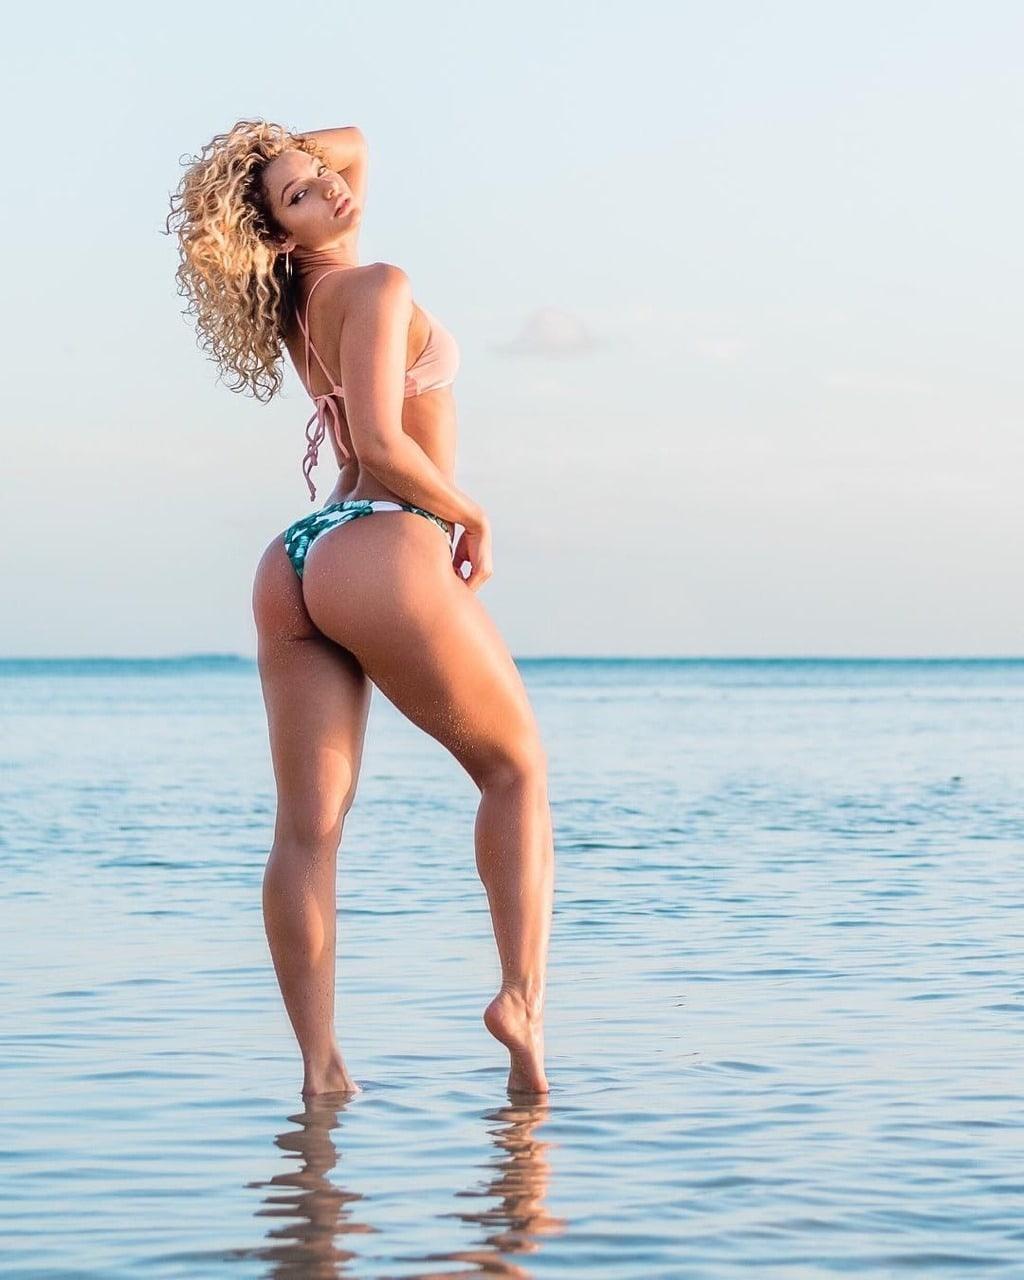 Pussy Bikini Lauren Wood naked photo 2017